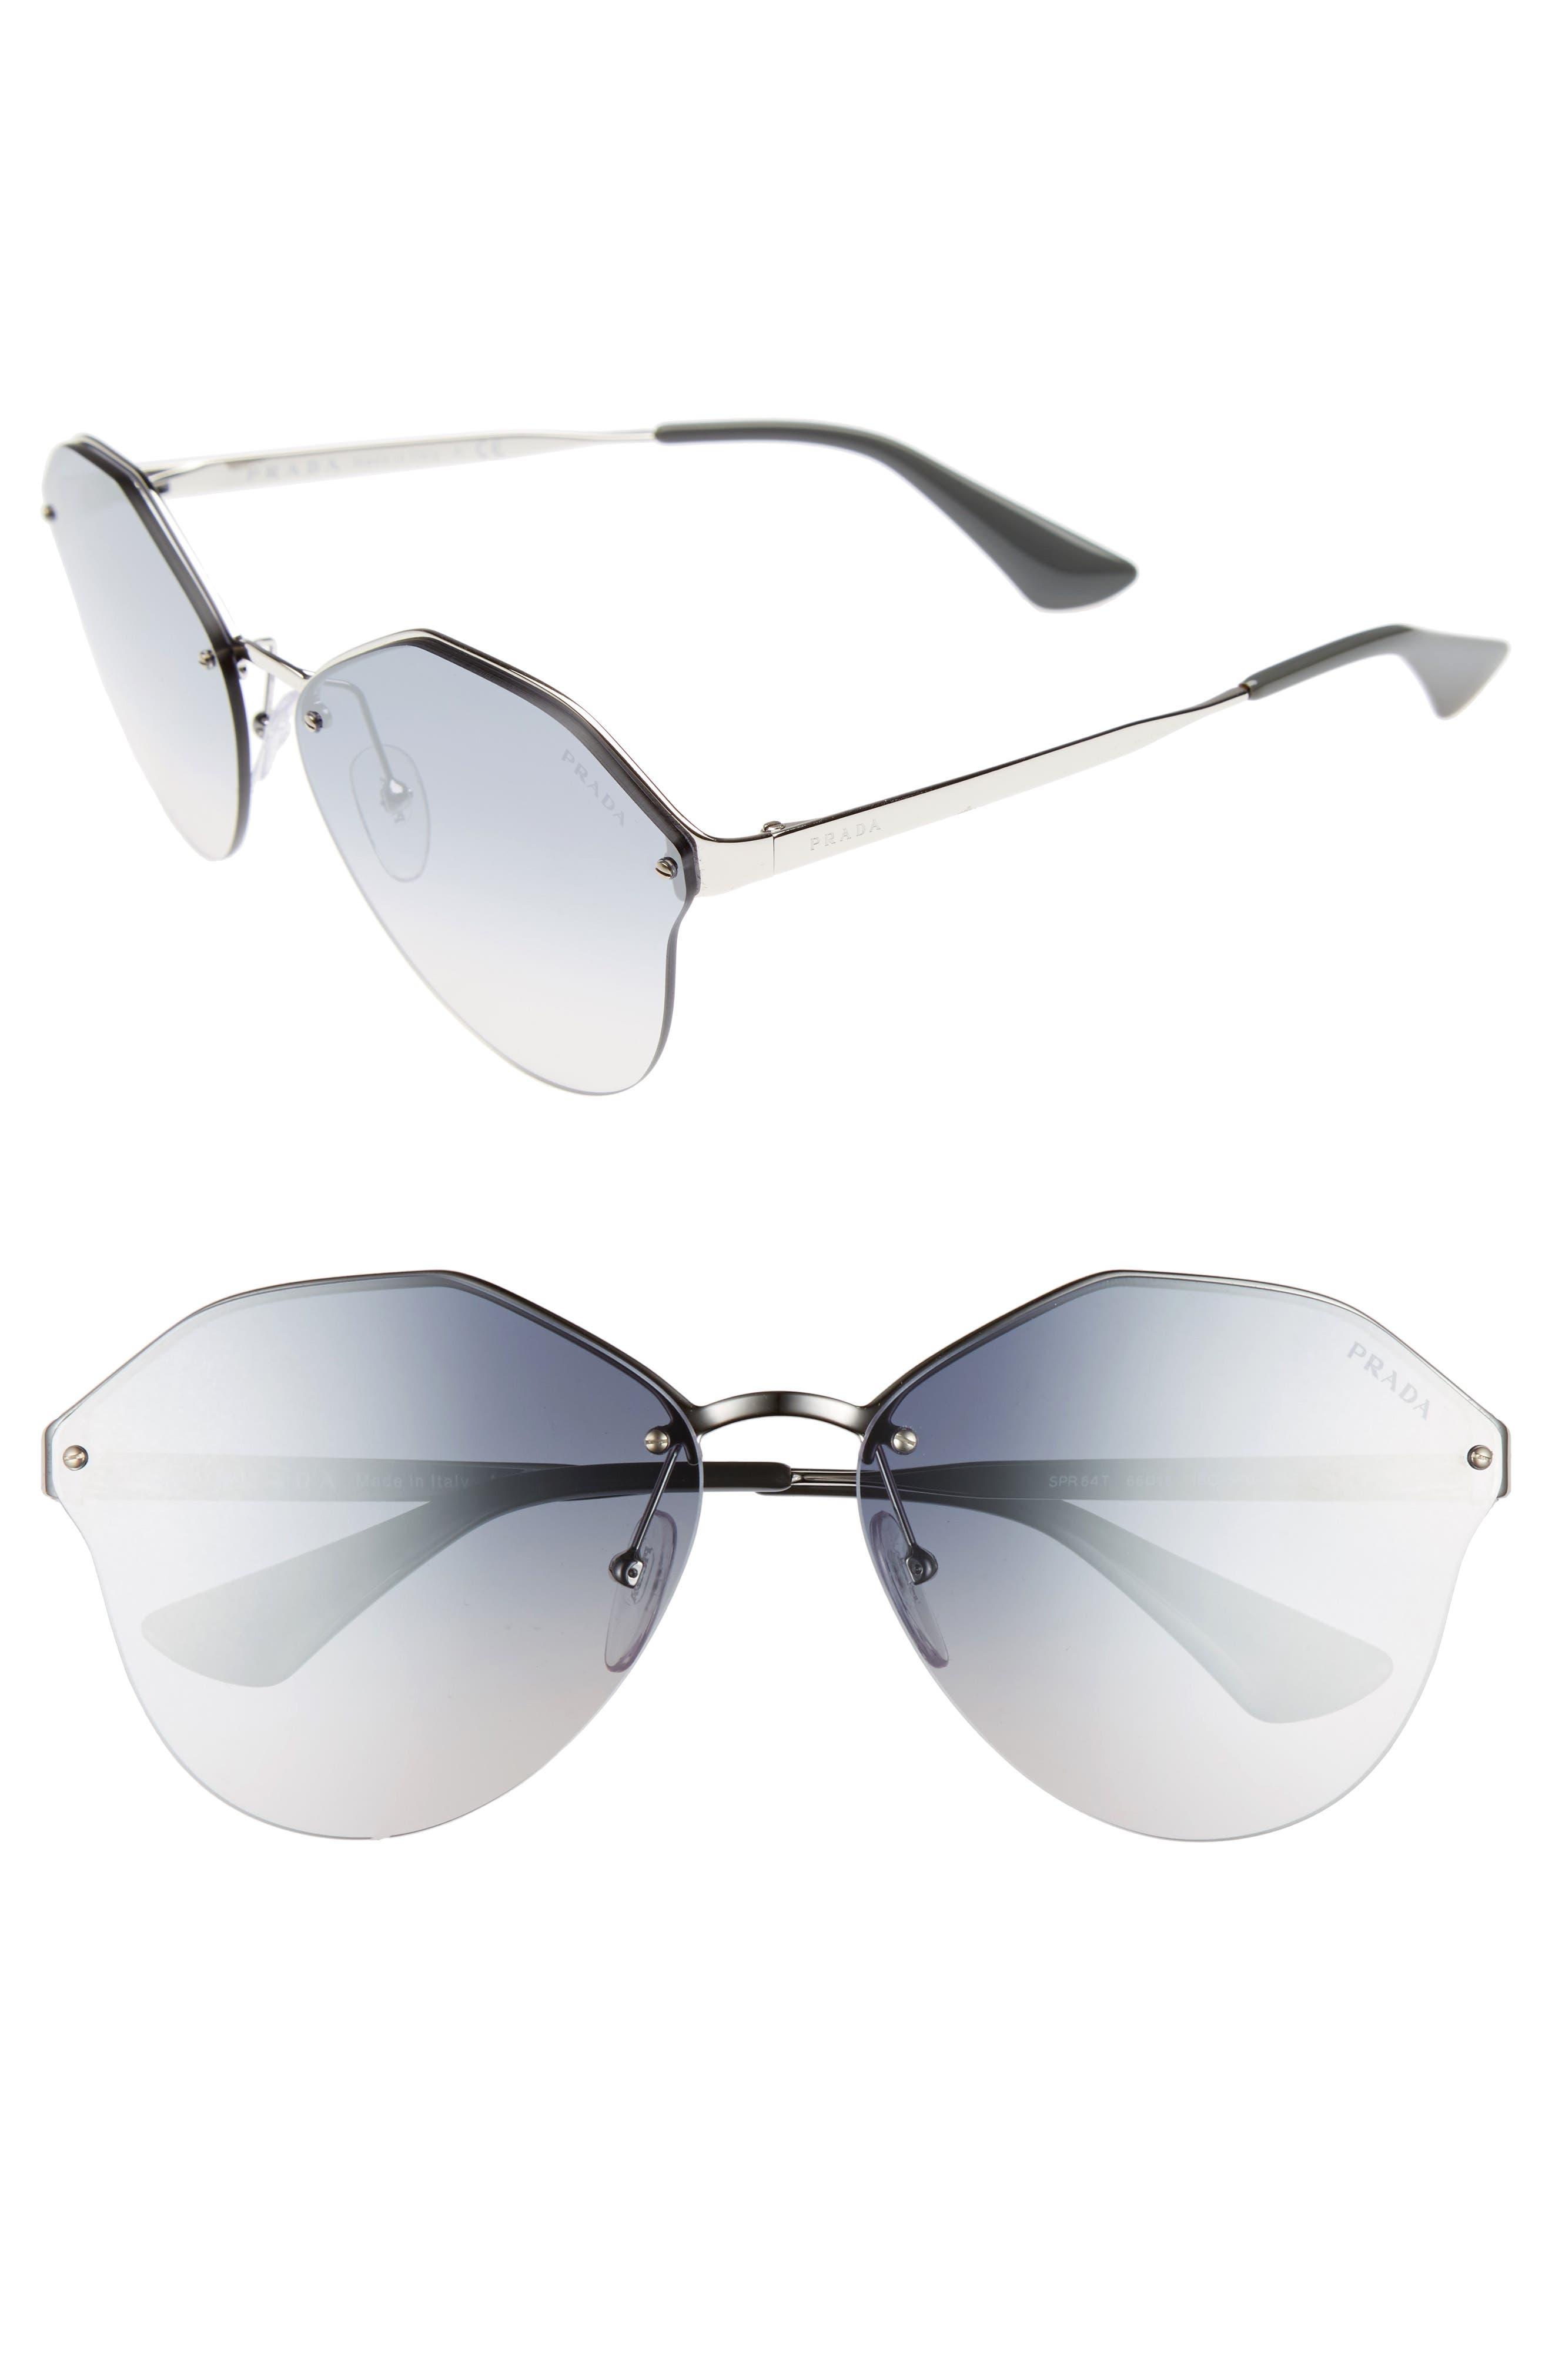 66mm Gradient Rimless Sunglasses,                         Main,                         color, Silver/ Blue